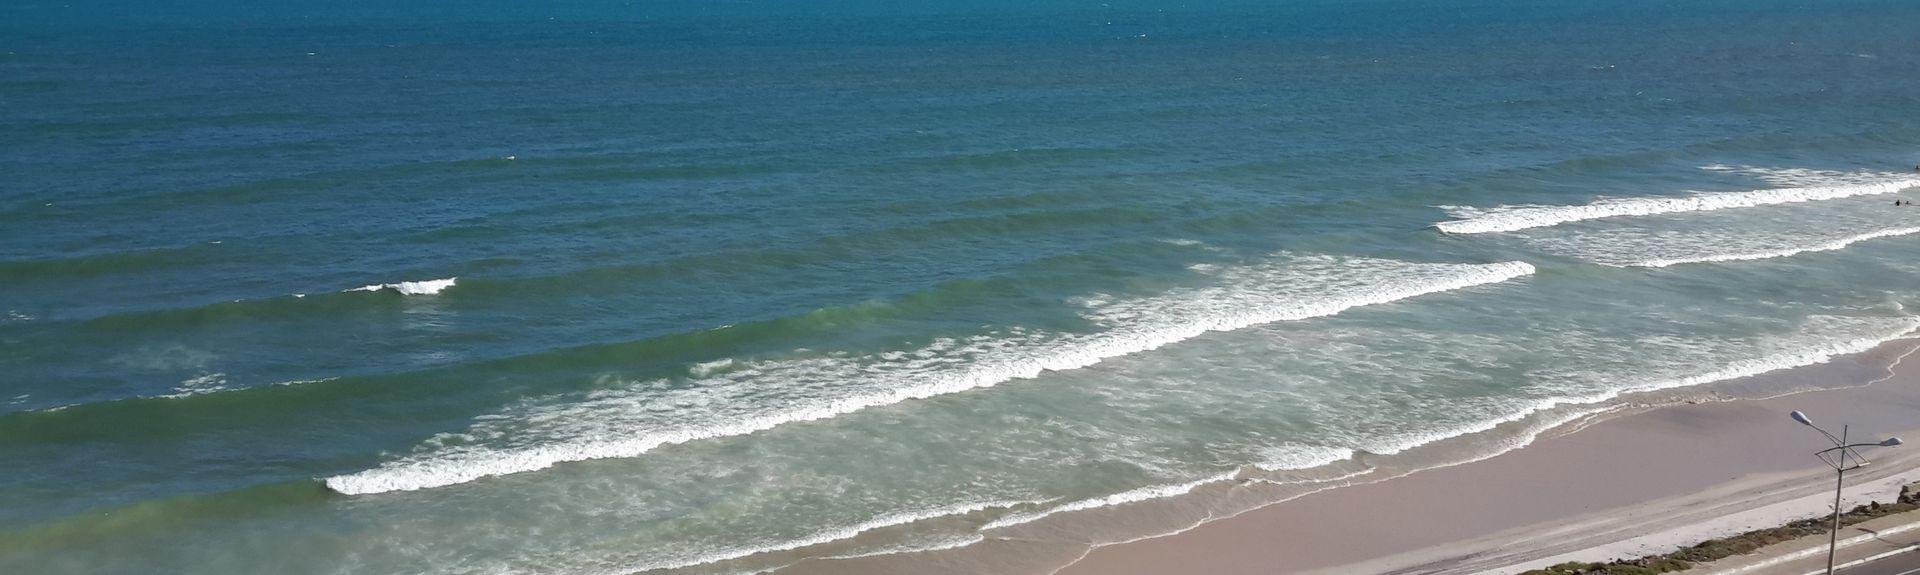 Praia do saco, Alagoas (État), Brésil